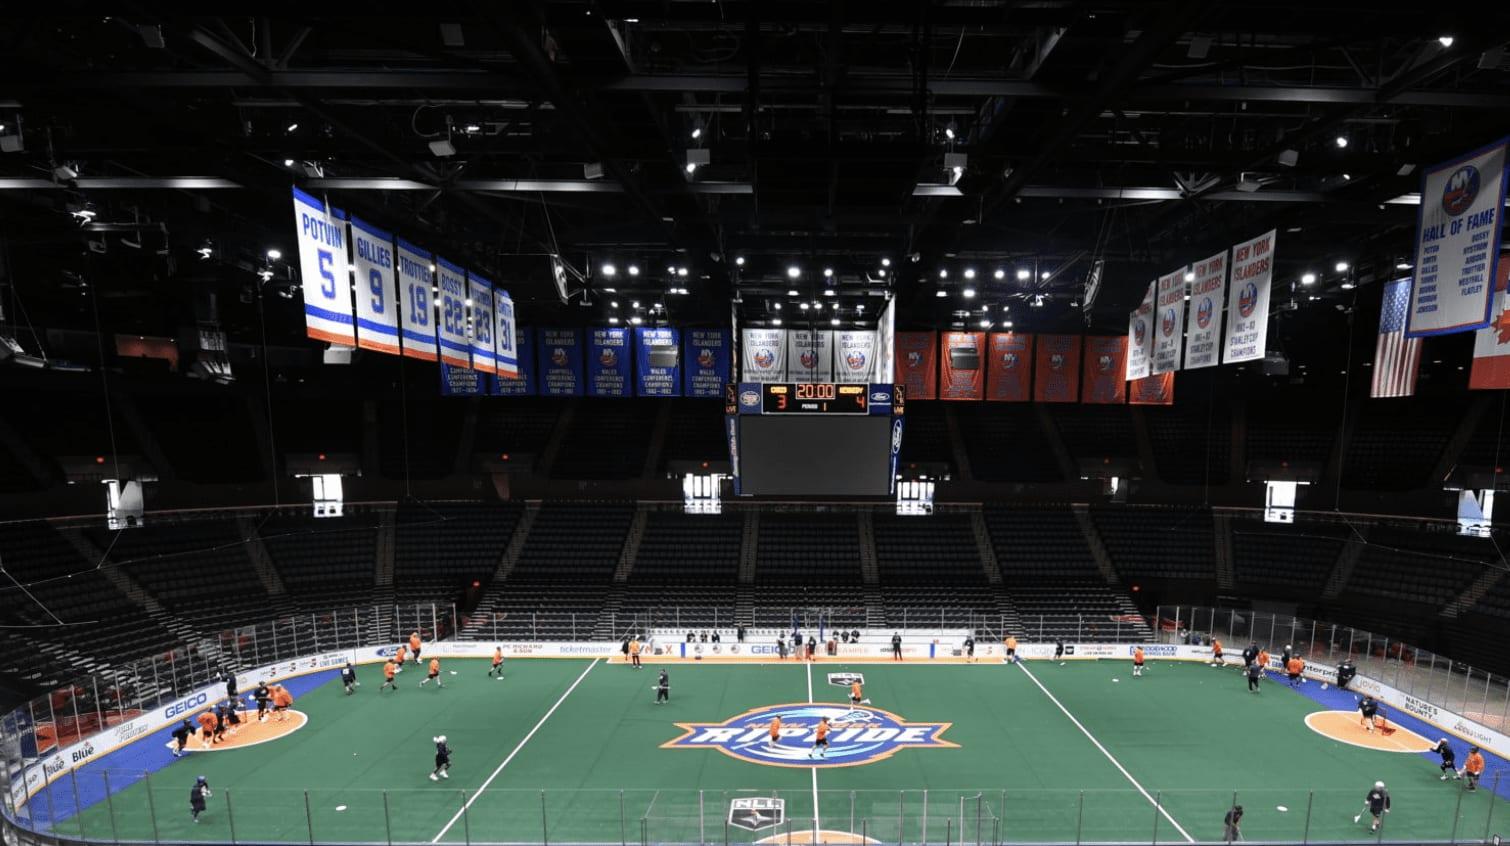 new york riptide nll national lacrosse league pro lacrosse box lacrosse